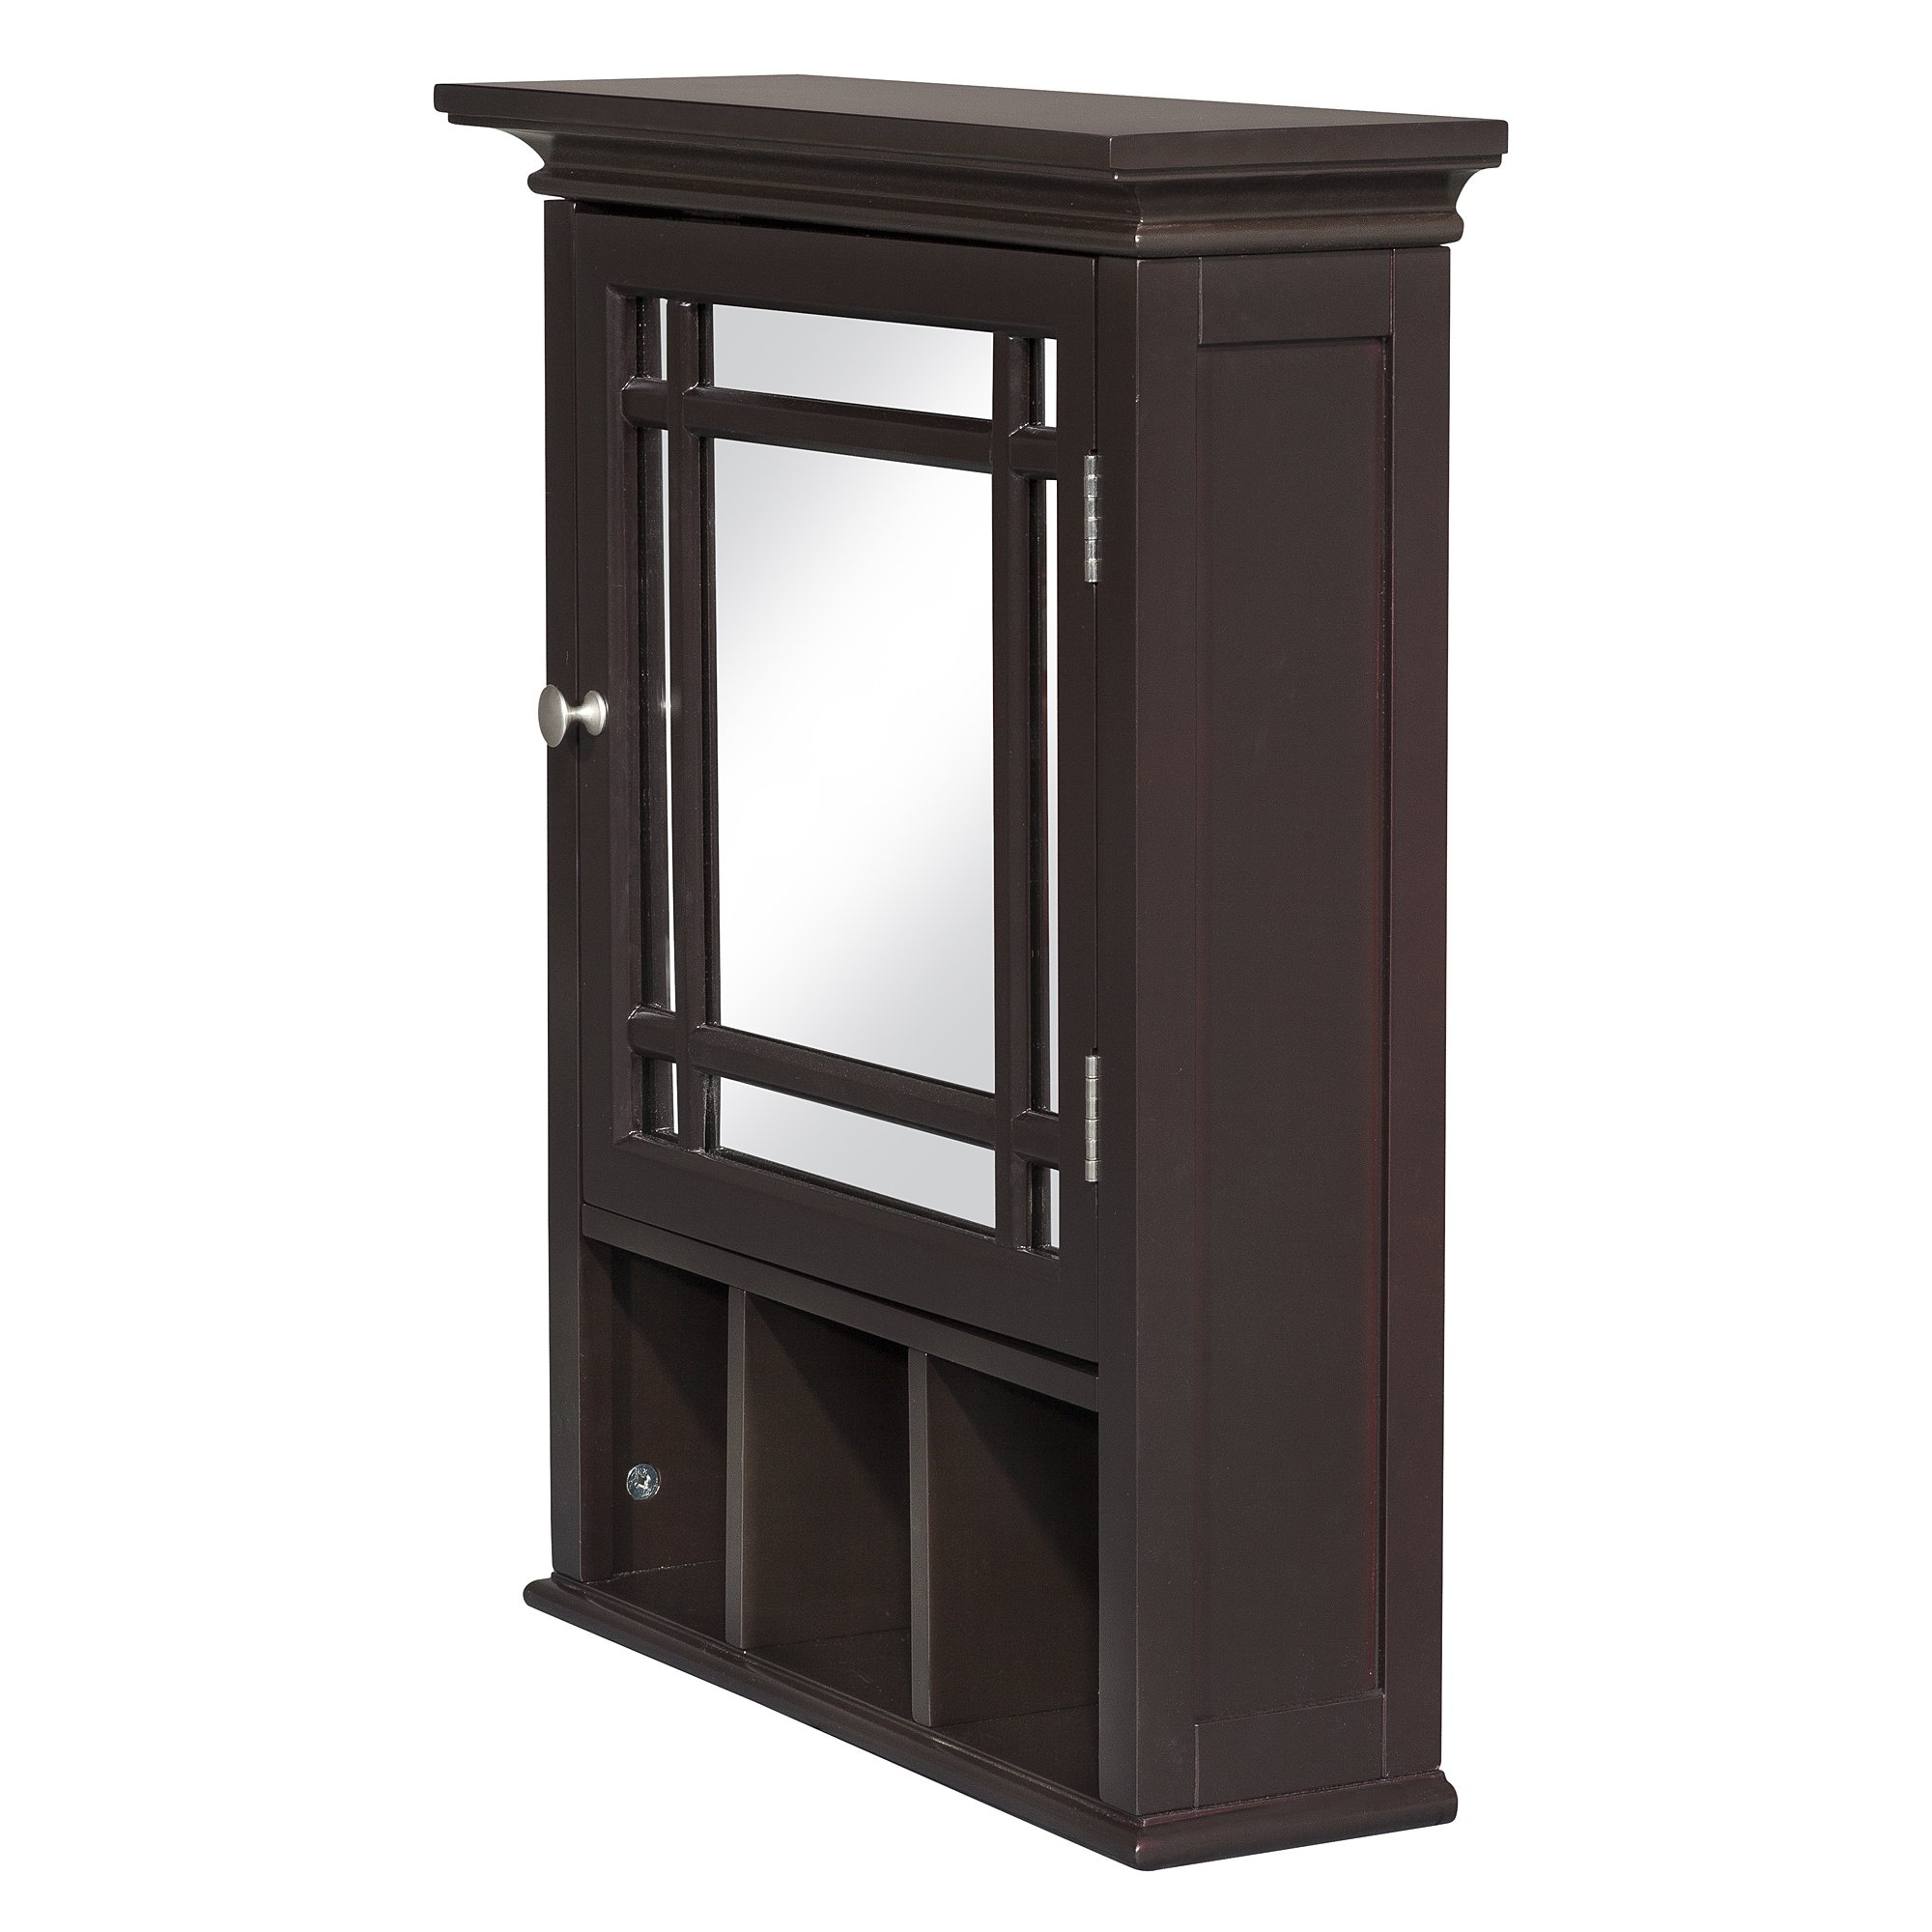 Elegant Home Fashion Neal Medicine Cabinet by Elegant Home Fashion (Image #2)